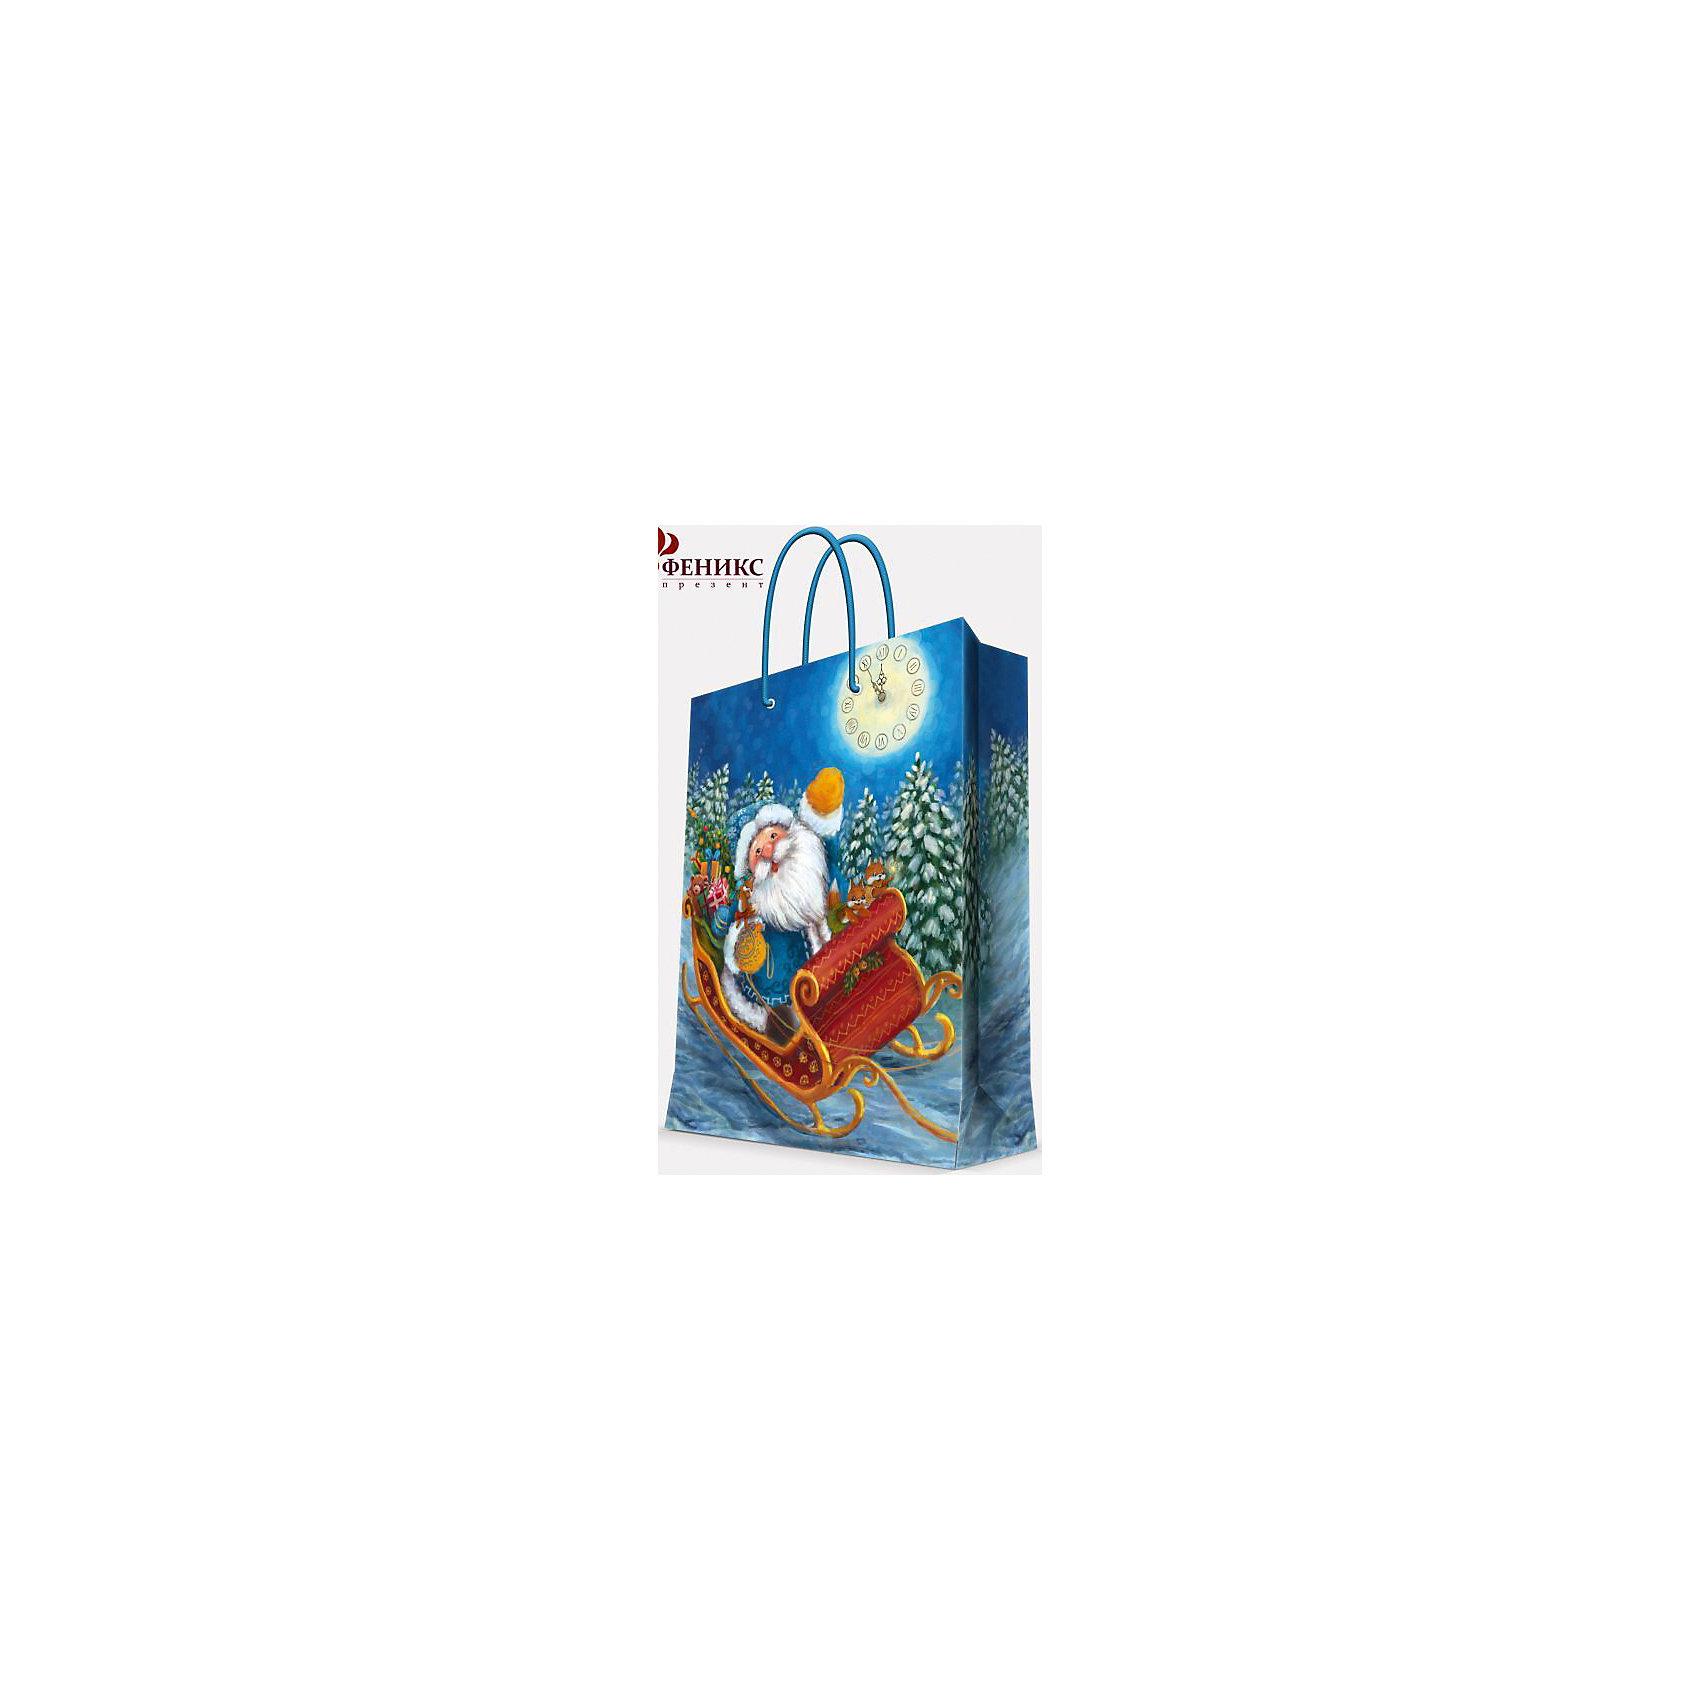 Magic Time Подарочный пакет Дед Мороз в санях 17,8*22,9*9,8 см magic time подарочный пакет новогодняя лампа 26 32 4 12 7 см